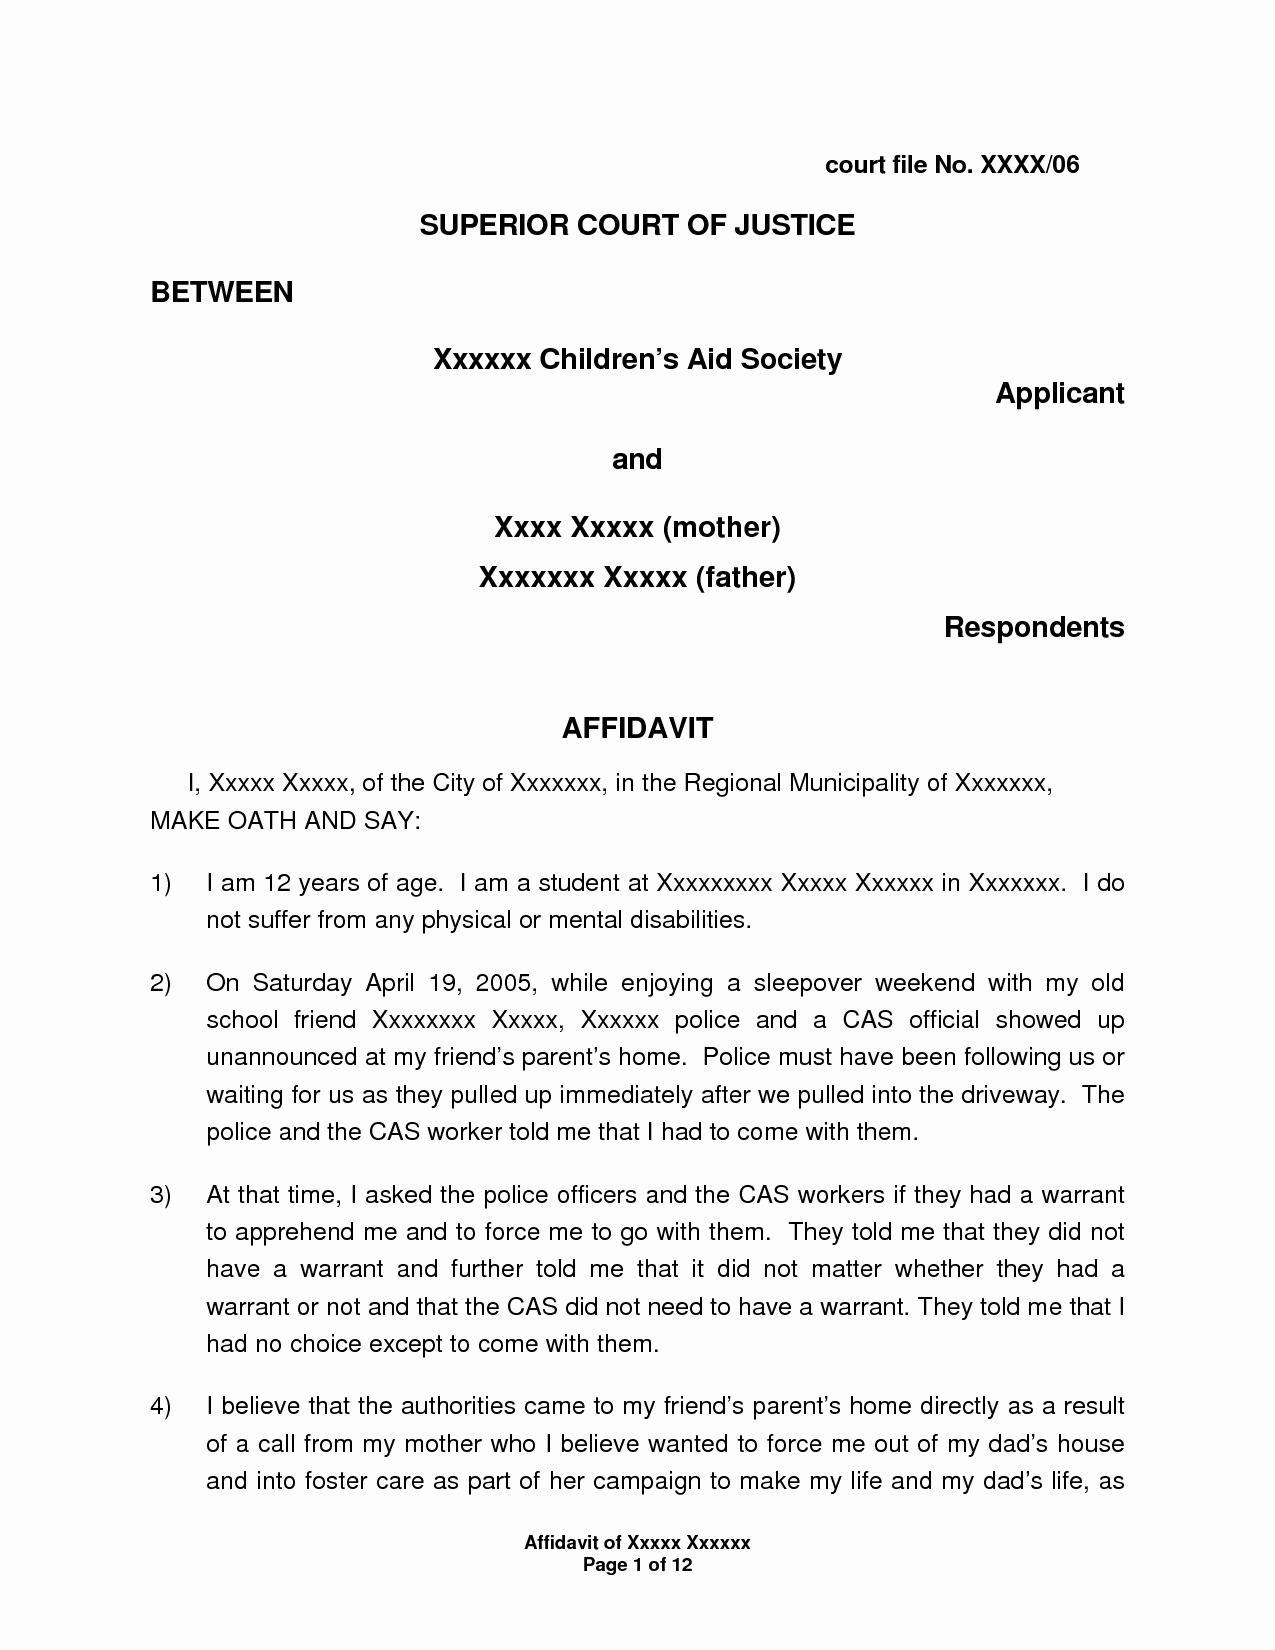 Sample Of Affidavit Of Support Letter Inspirational I 751 Affidavit Letter Sample